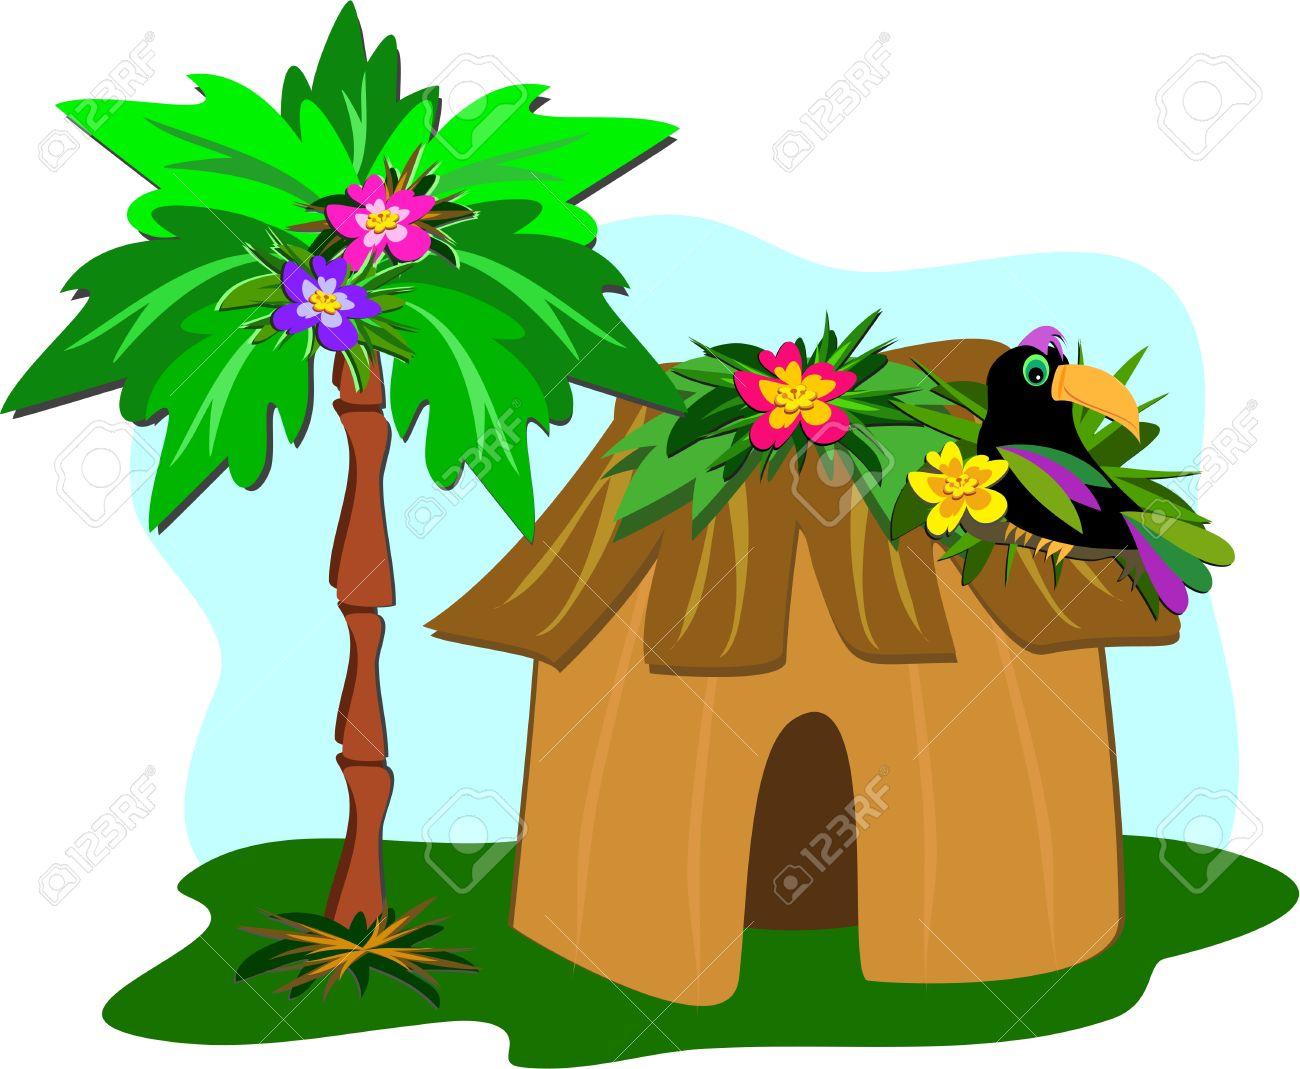 Hut clipart grass hut Grass Hut Clipart Grass Download